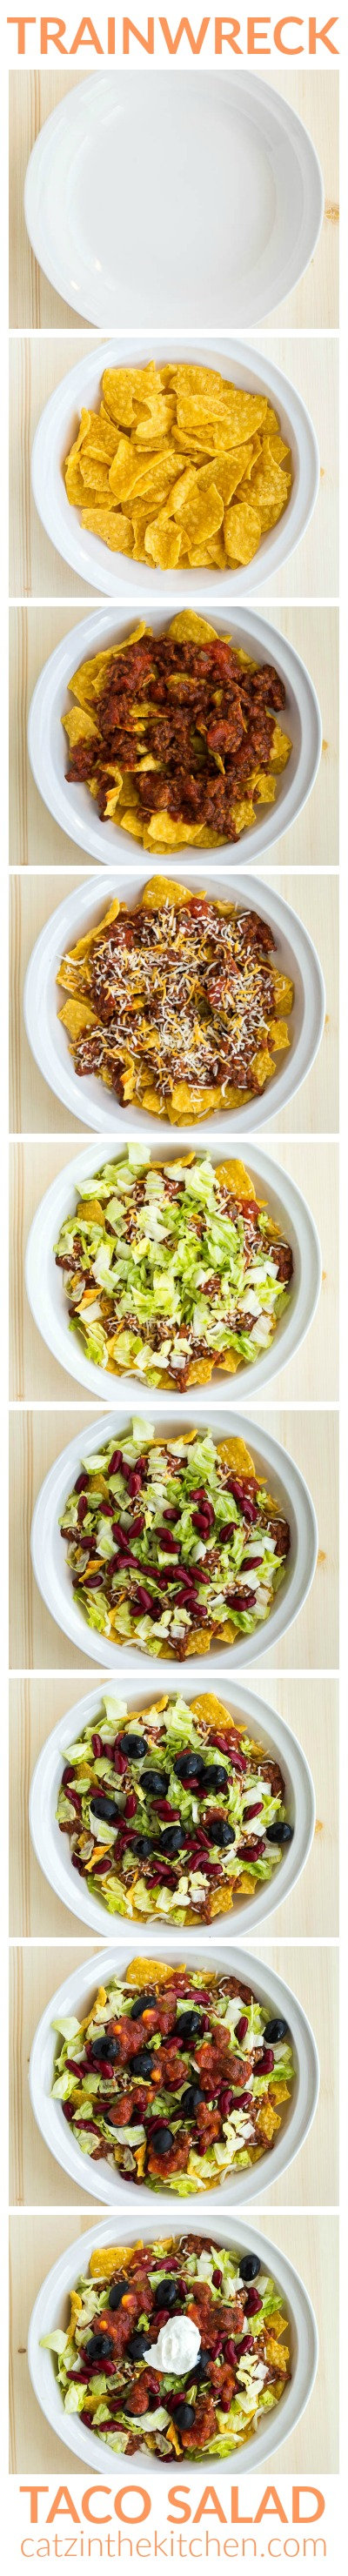 Trainwreck Taco Salad   Catz in the Kitchen   catzinthekitchen.com   #trainwreck #salad #taco #recipe